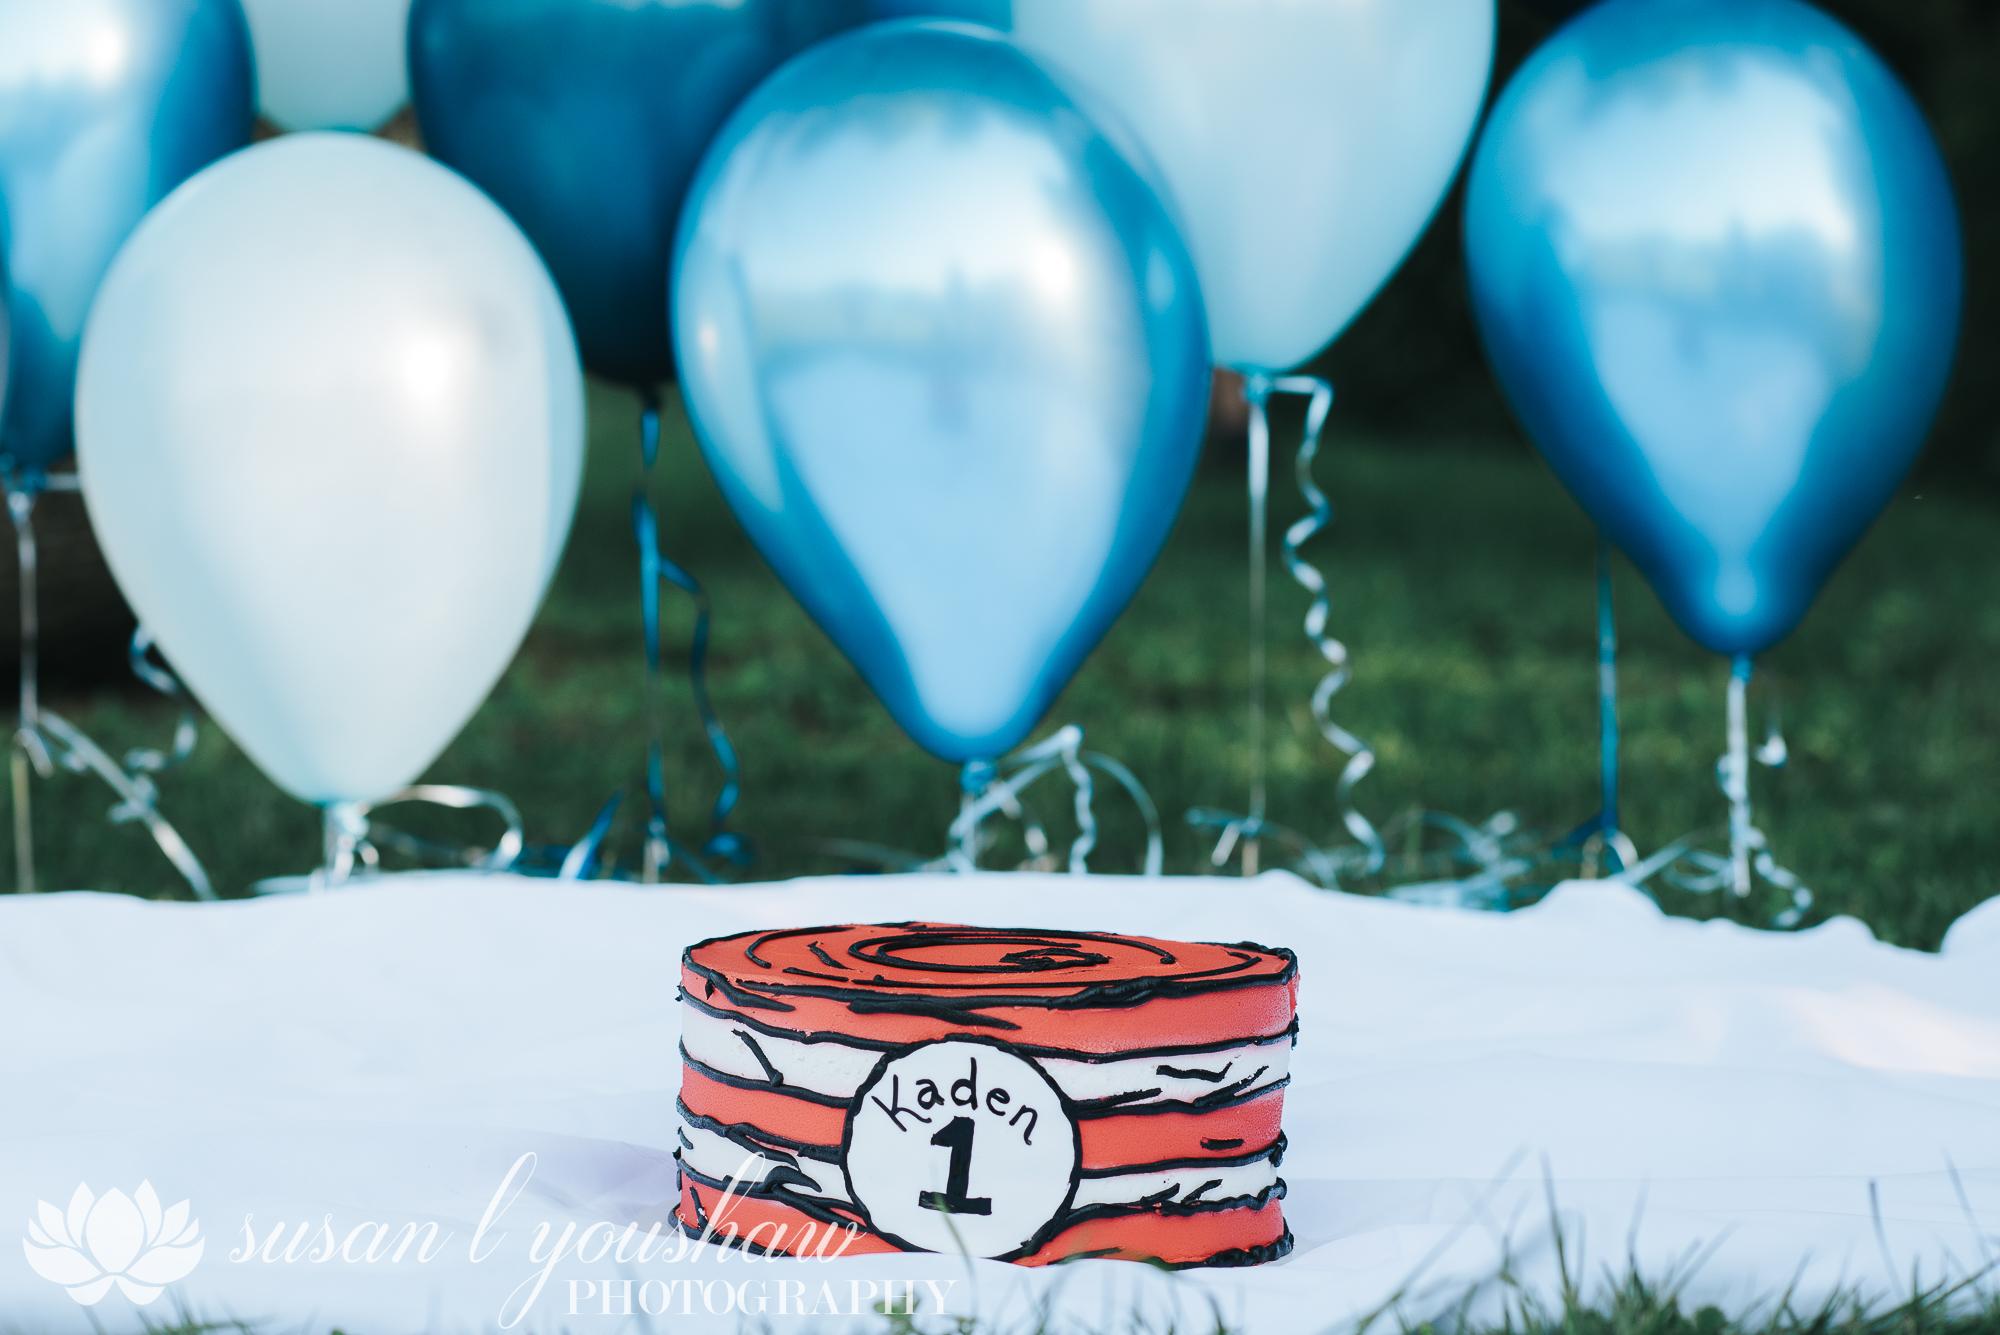 BLOG Kaden's First Birthday 07-18-2018 SLY Photography LLC-8.jpg